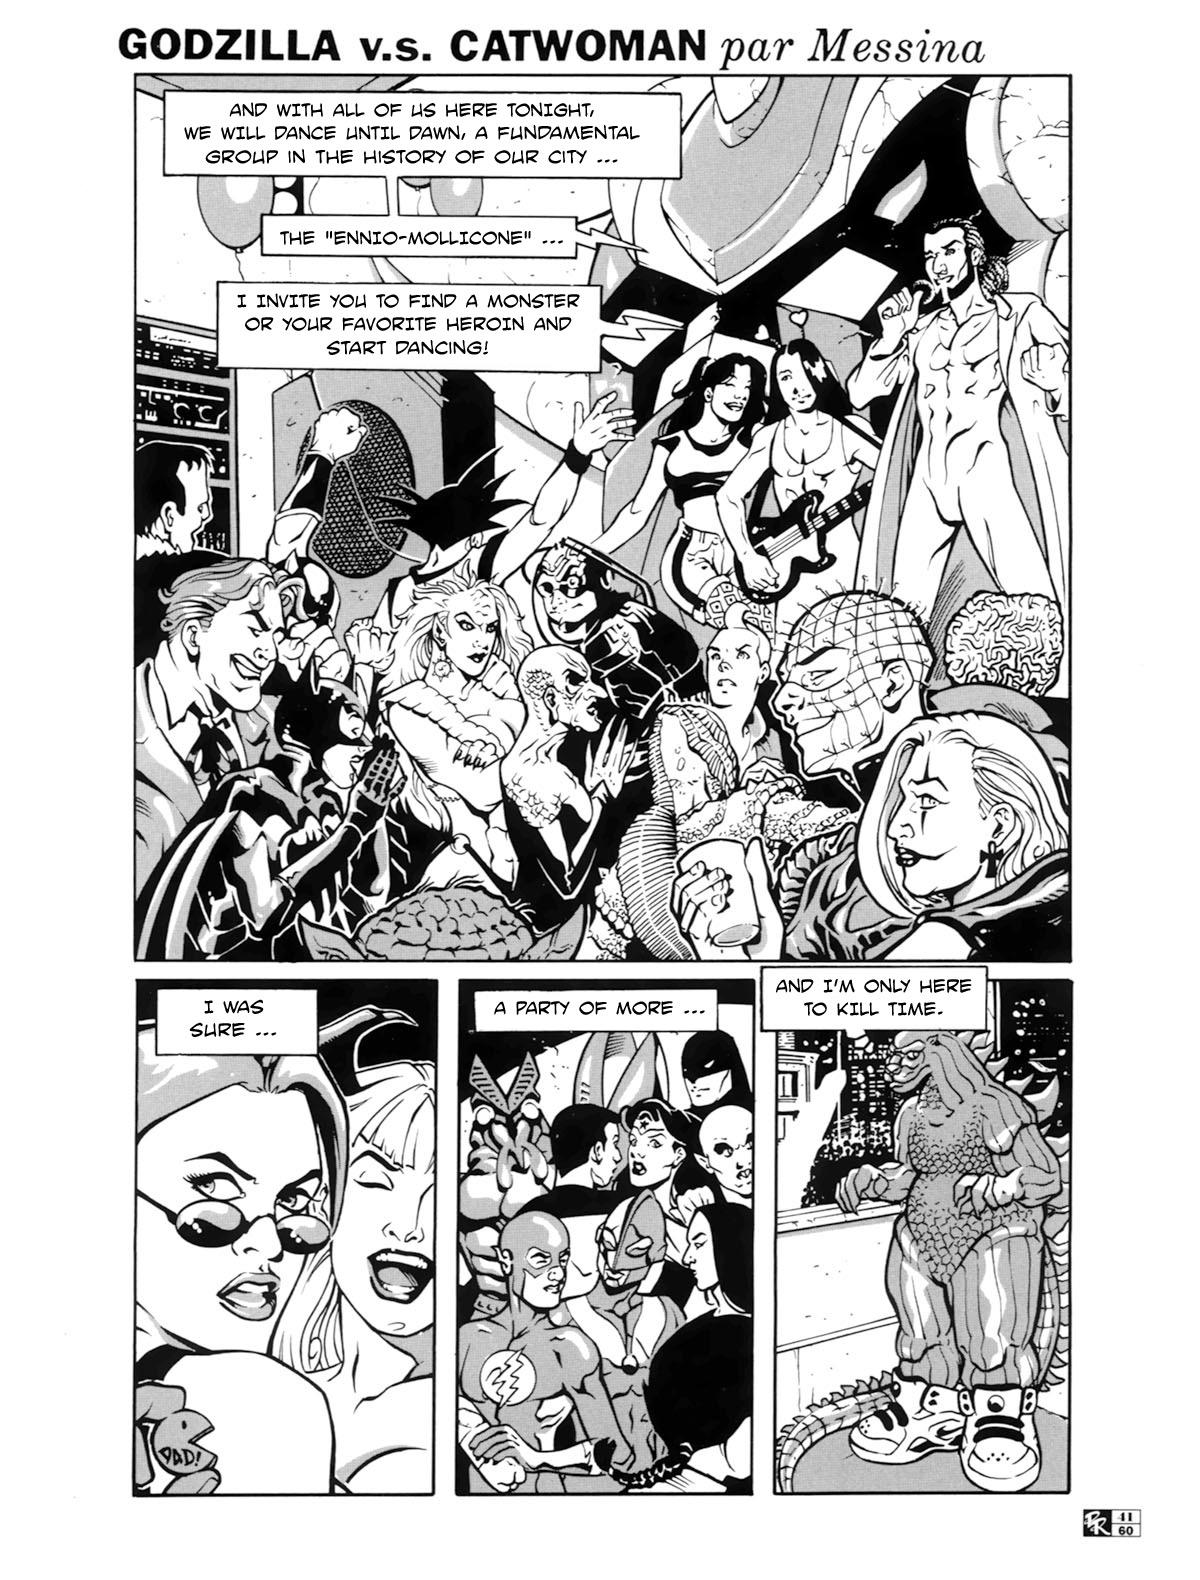 surefap.org__Godzilla-V.S.-Catwoman-01_Gotofap.tk__2700166024_3563619391.jpg